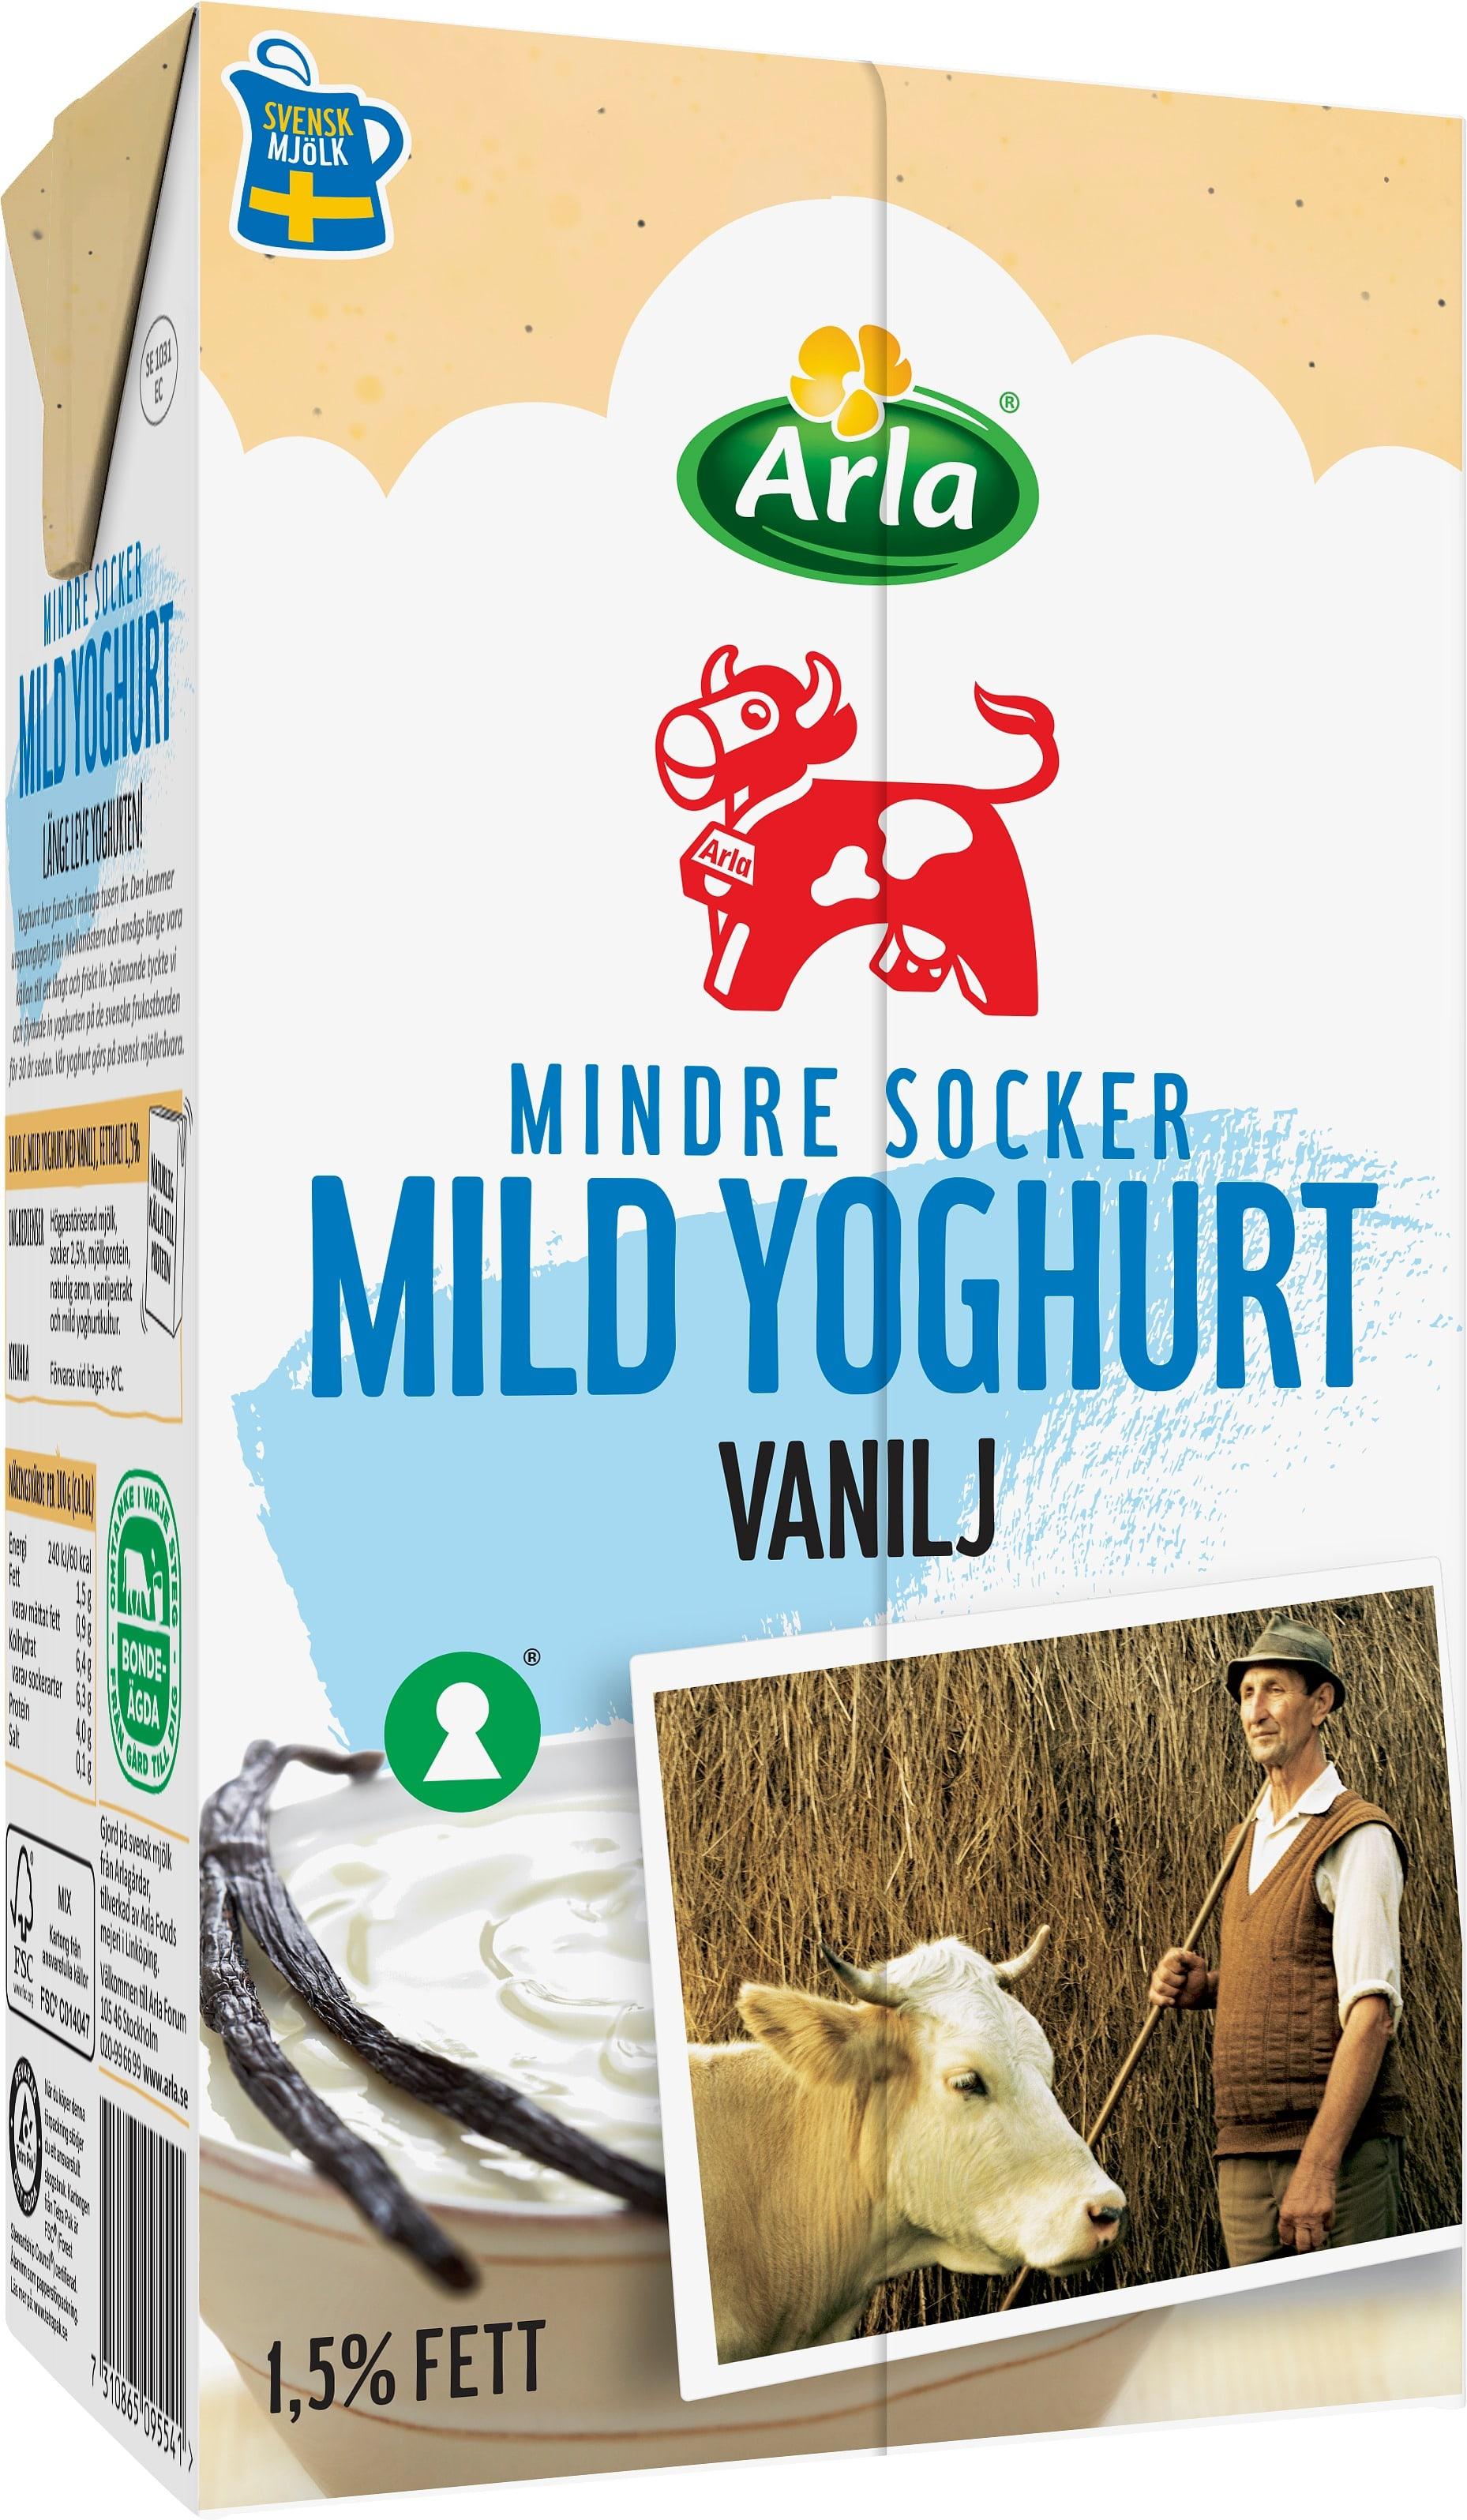 naturell yoghurt socker